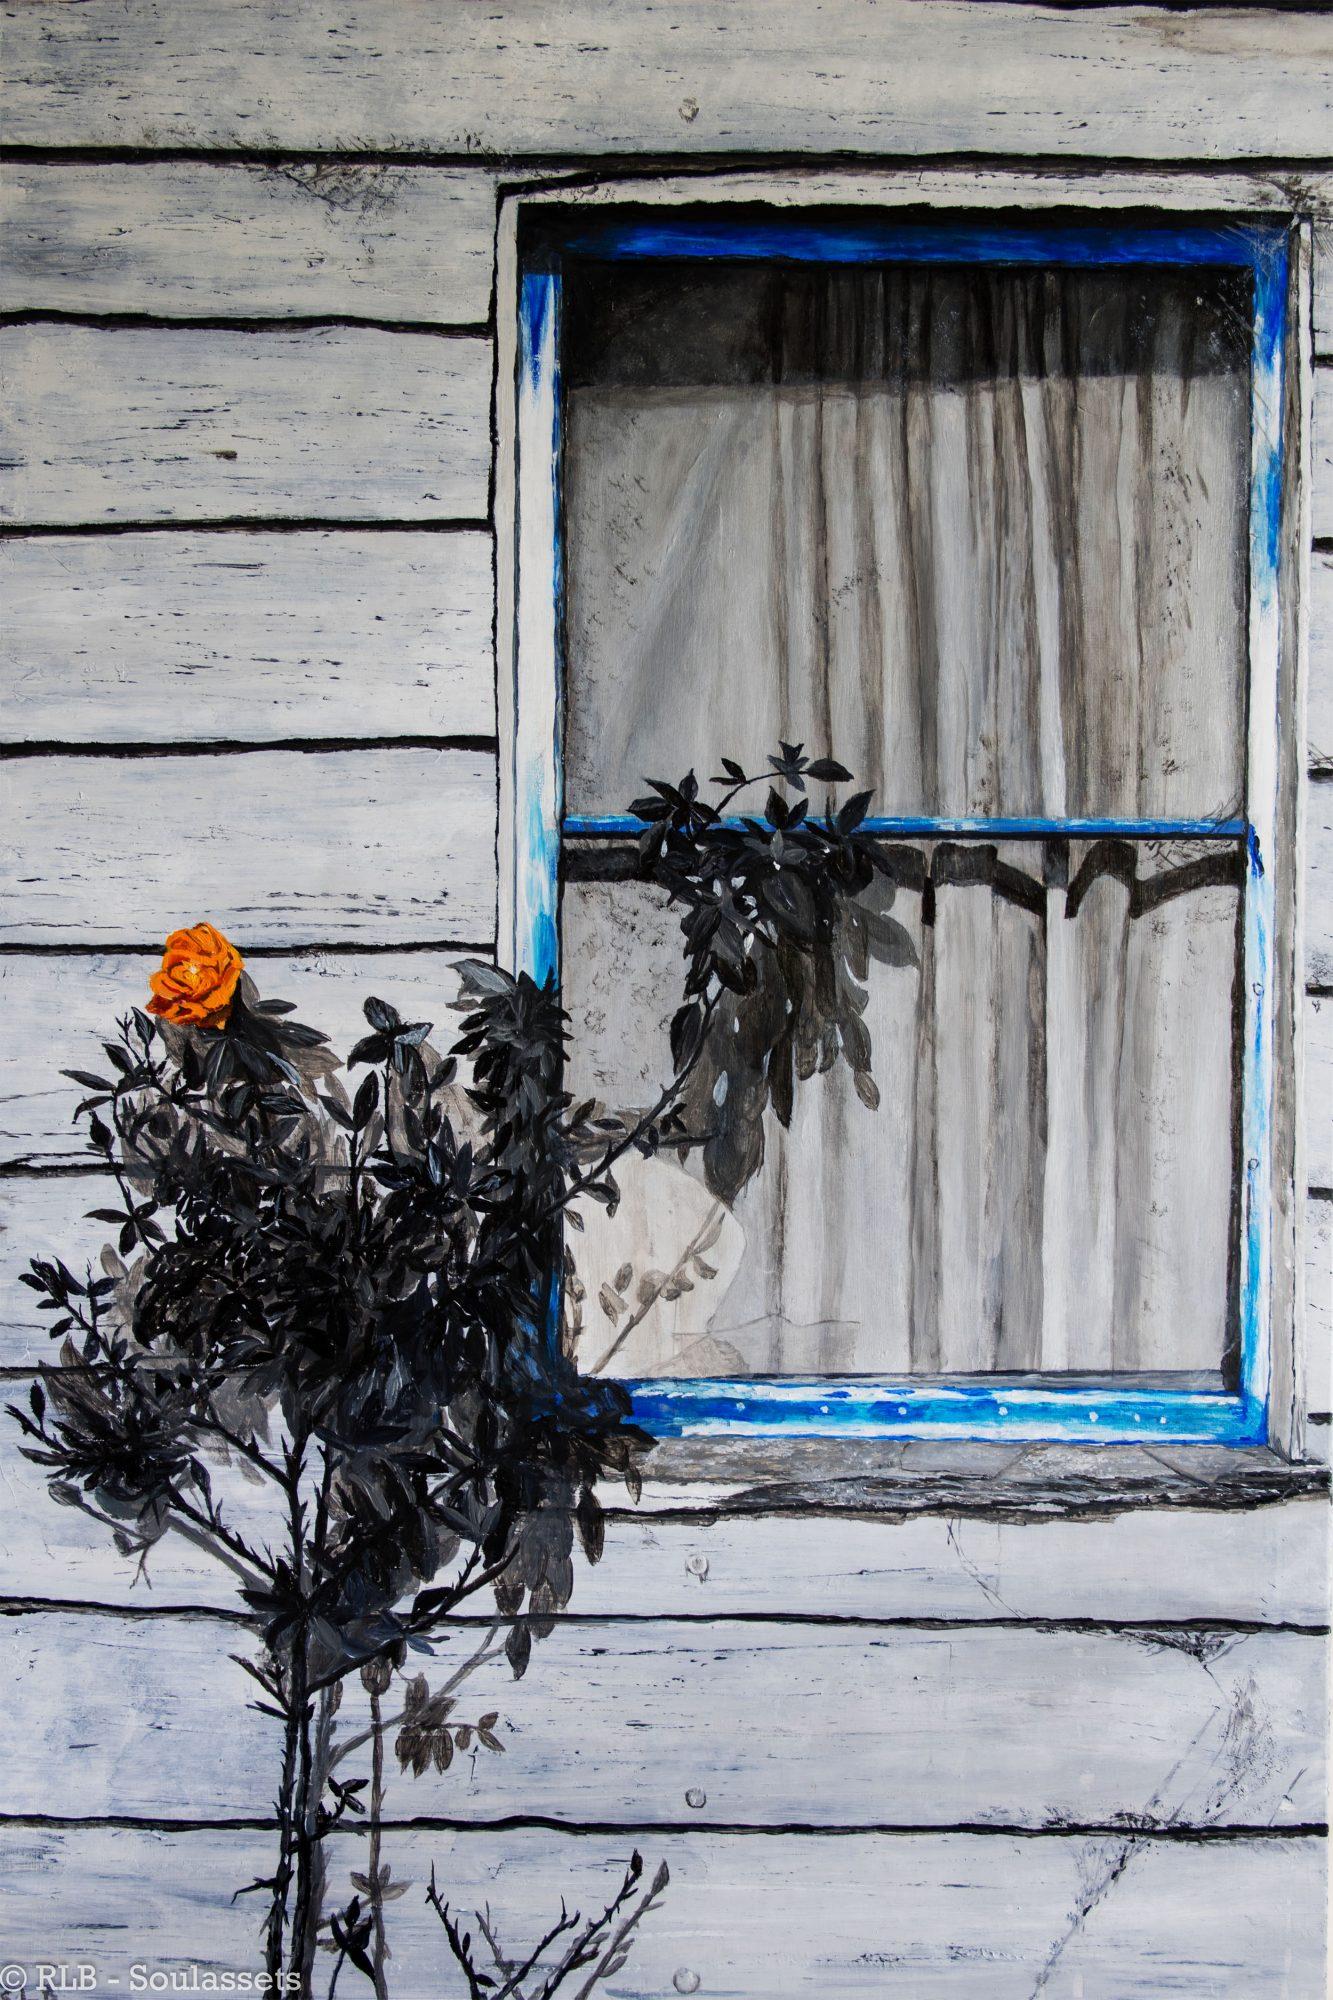 boo-radleys-window-rlb